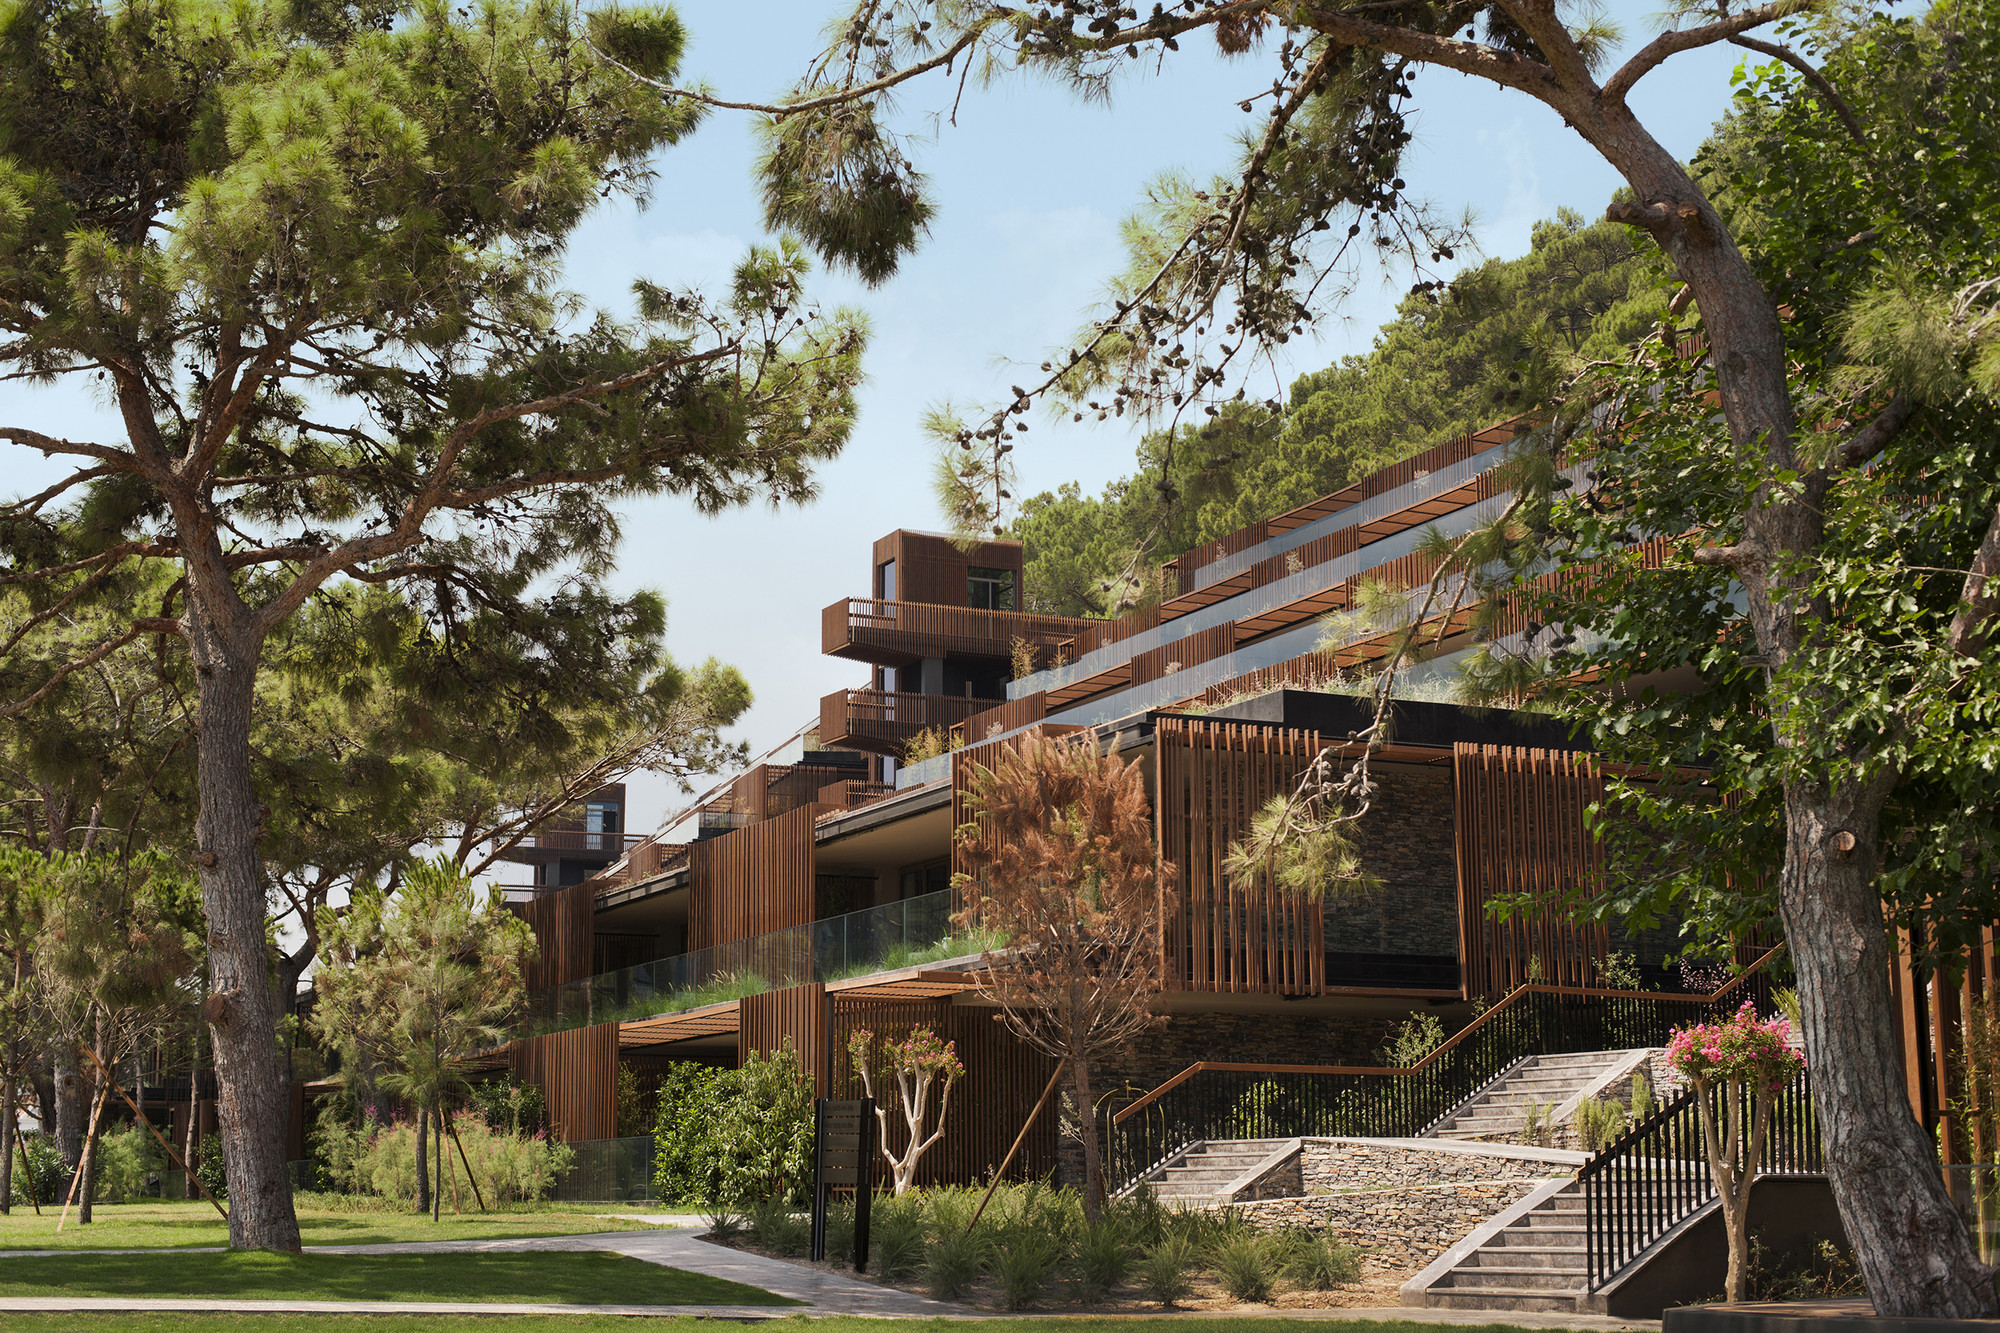 Maxx Royal Kemer Hotel  / Baraka Architects, Courtesy of Baraka Architects